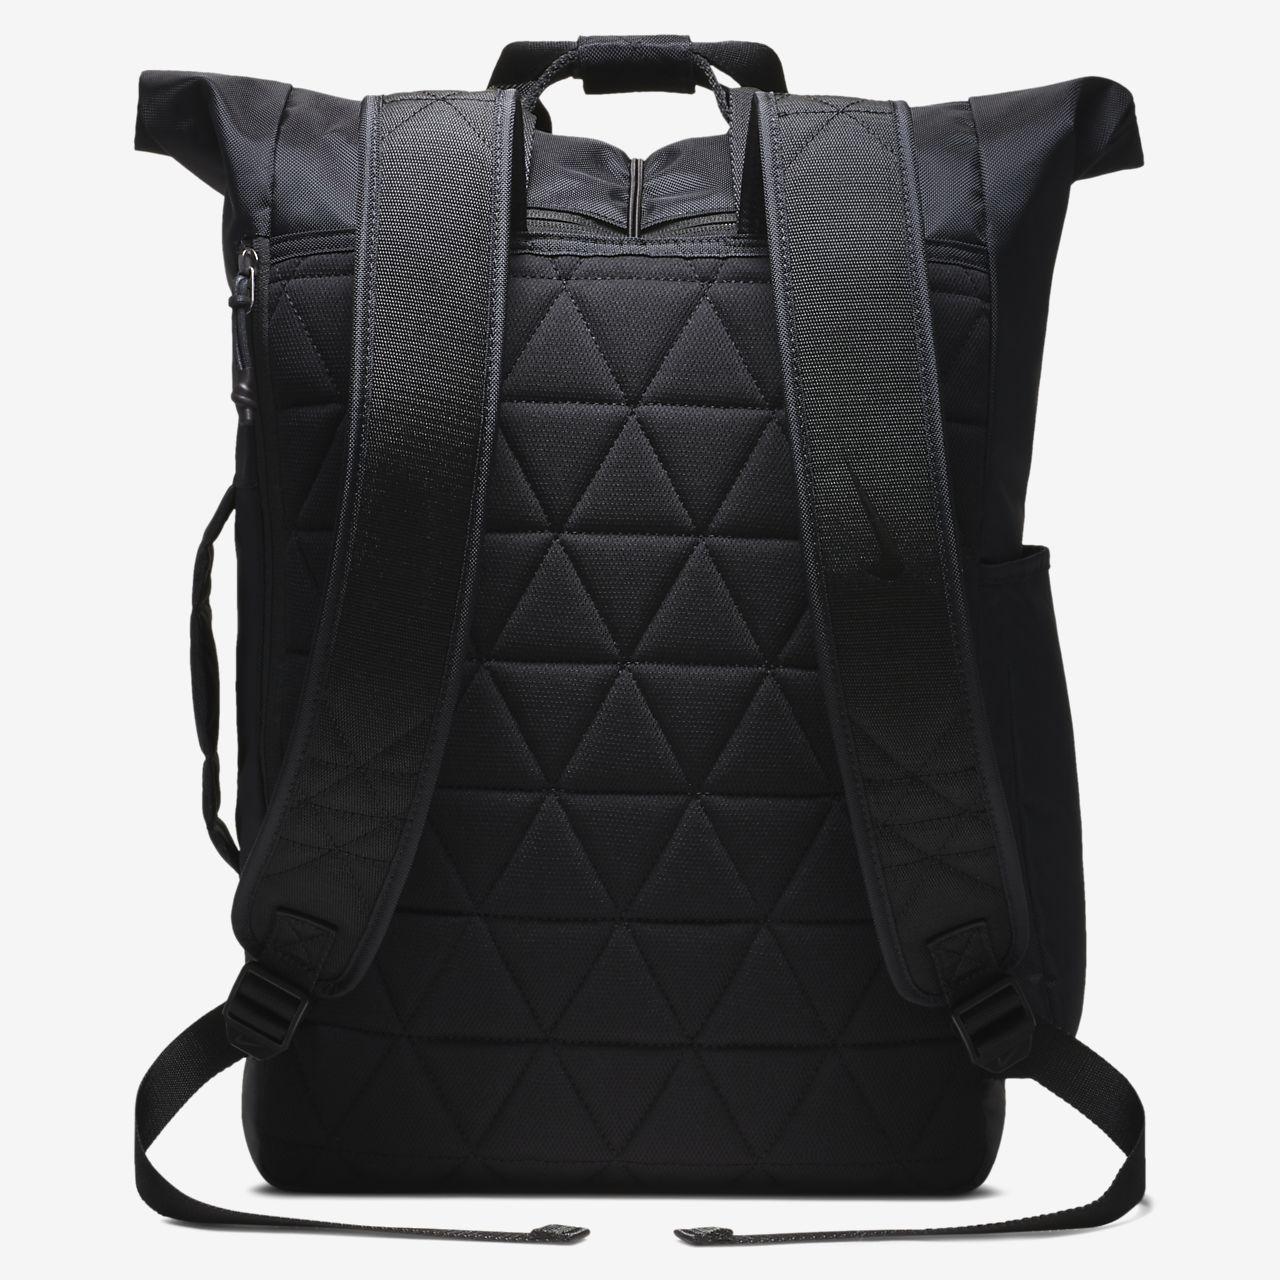 2355683ee4ba1 Nike Vapor Energy 2.0 Training Backpack. Nike.com CA